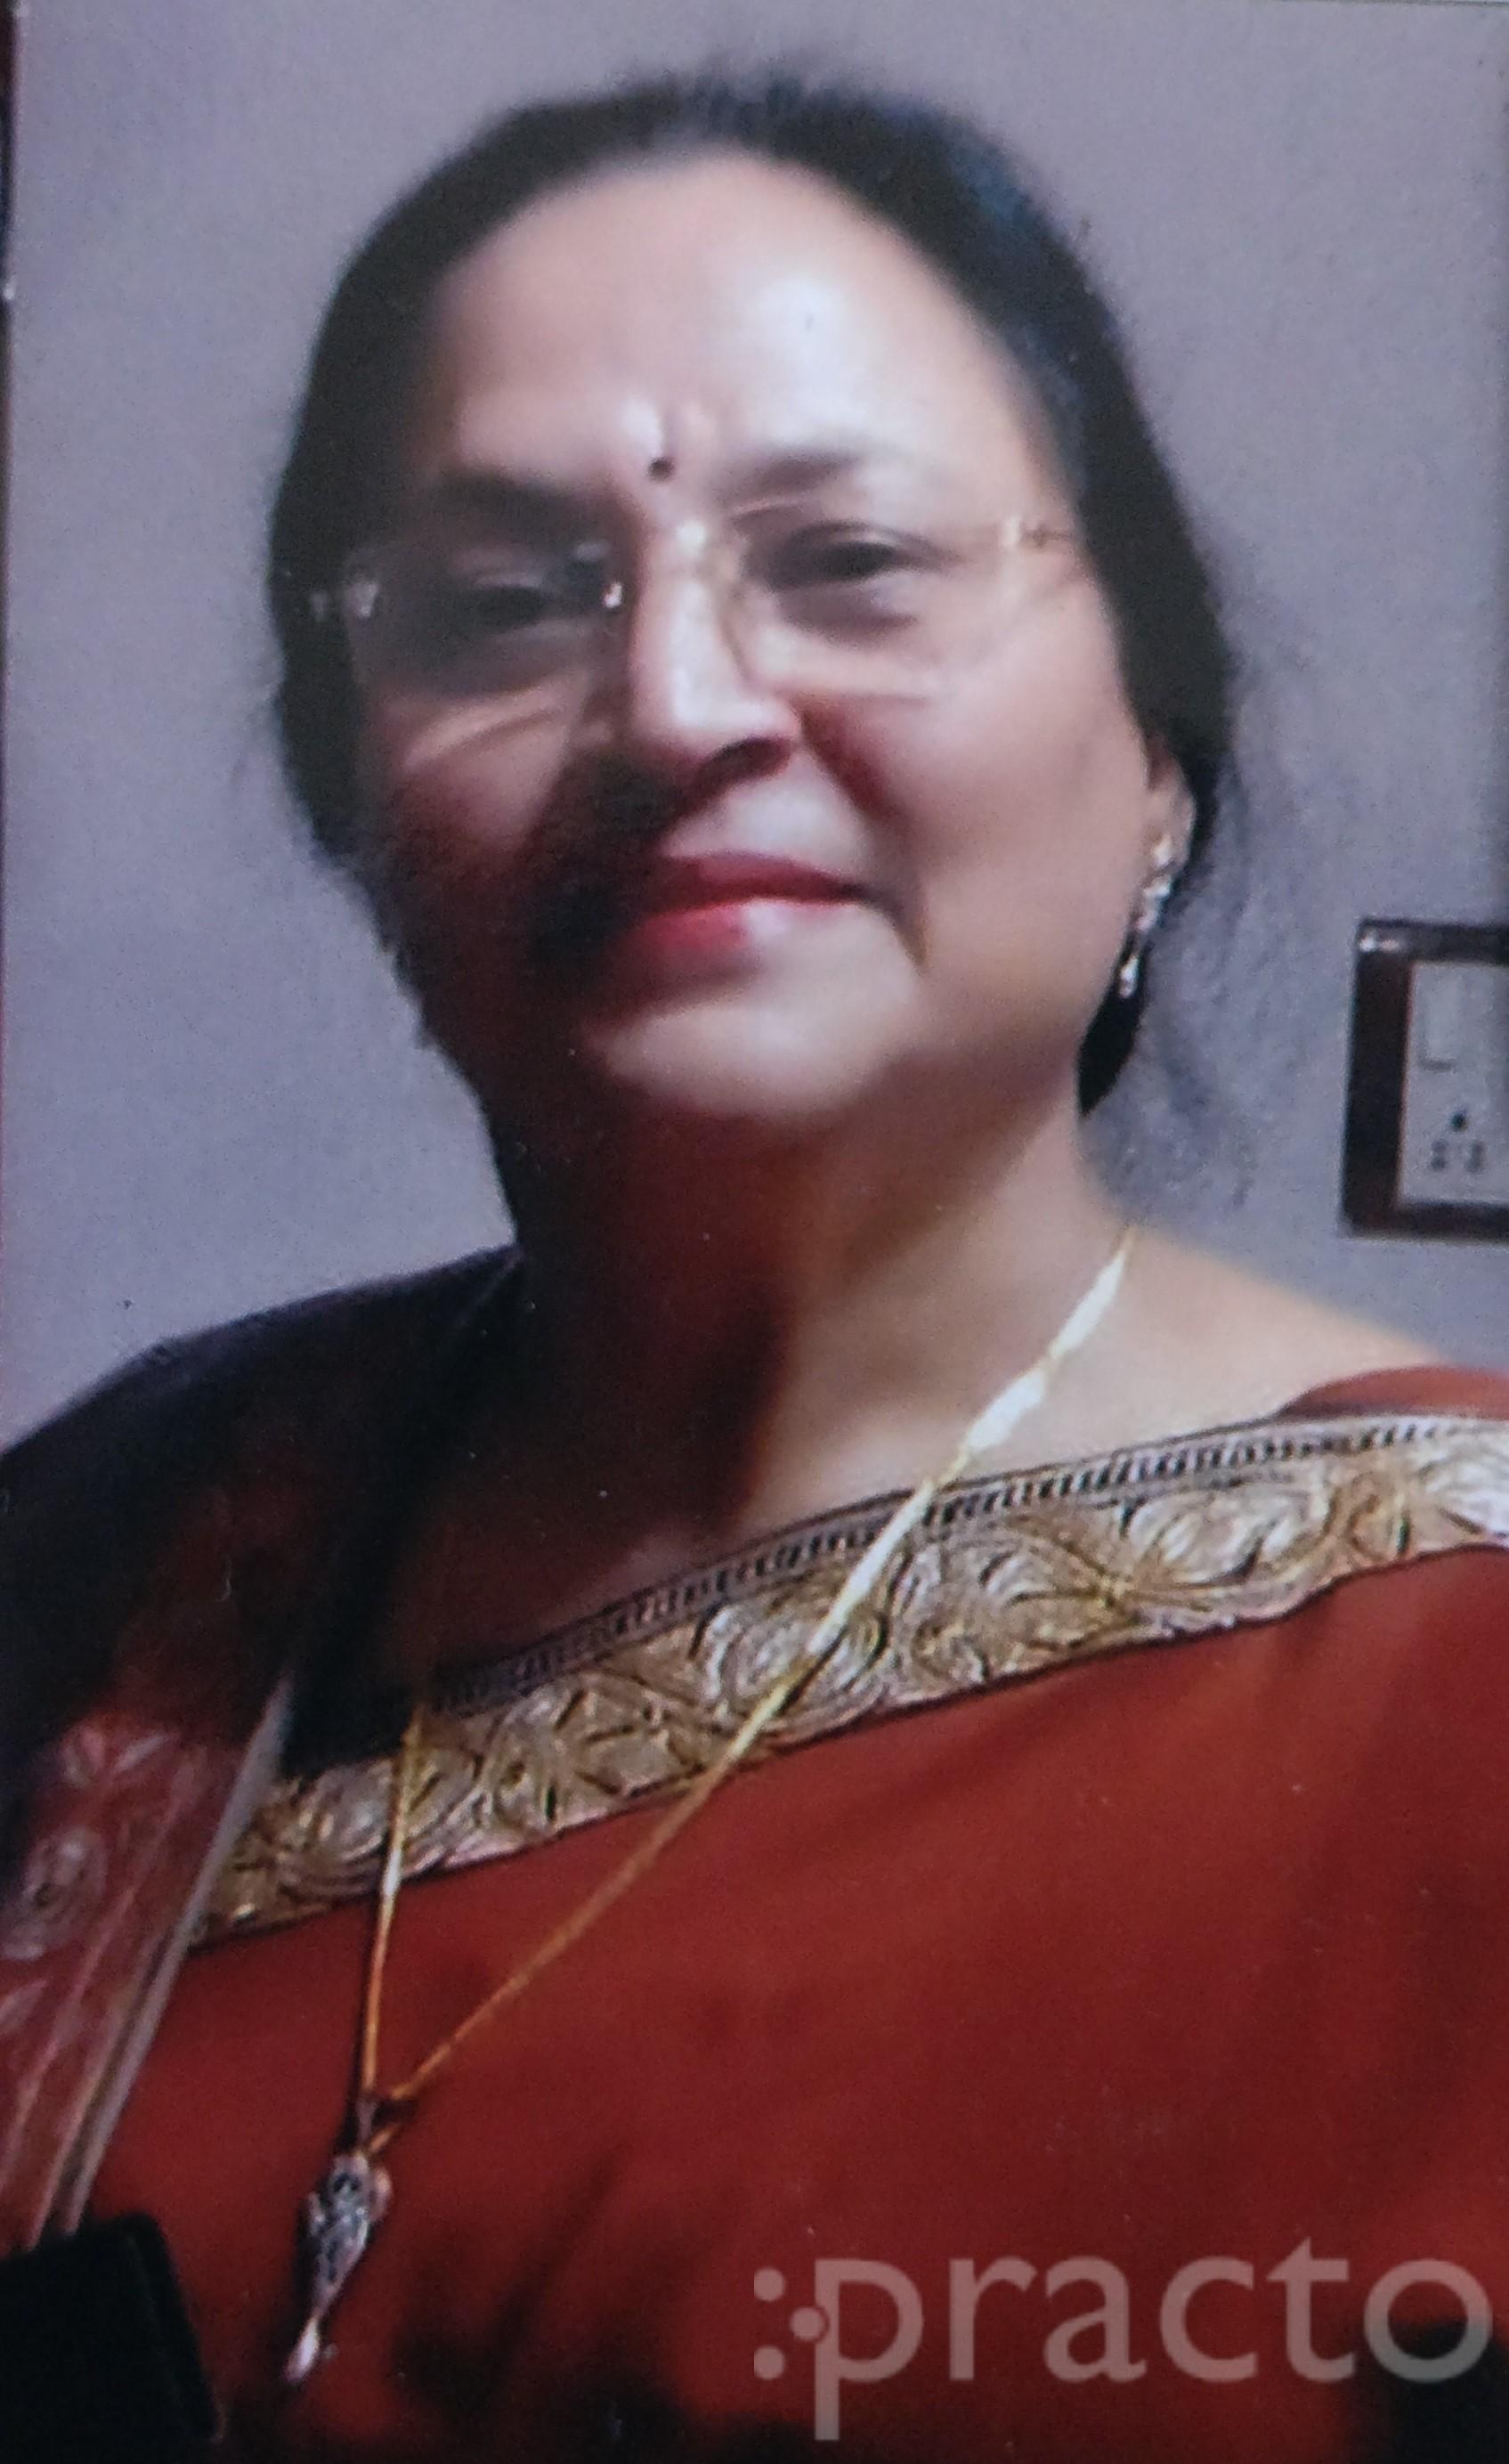 Dr. Pushpa Kaul - Gynecologist/Obstetrician